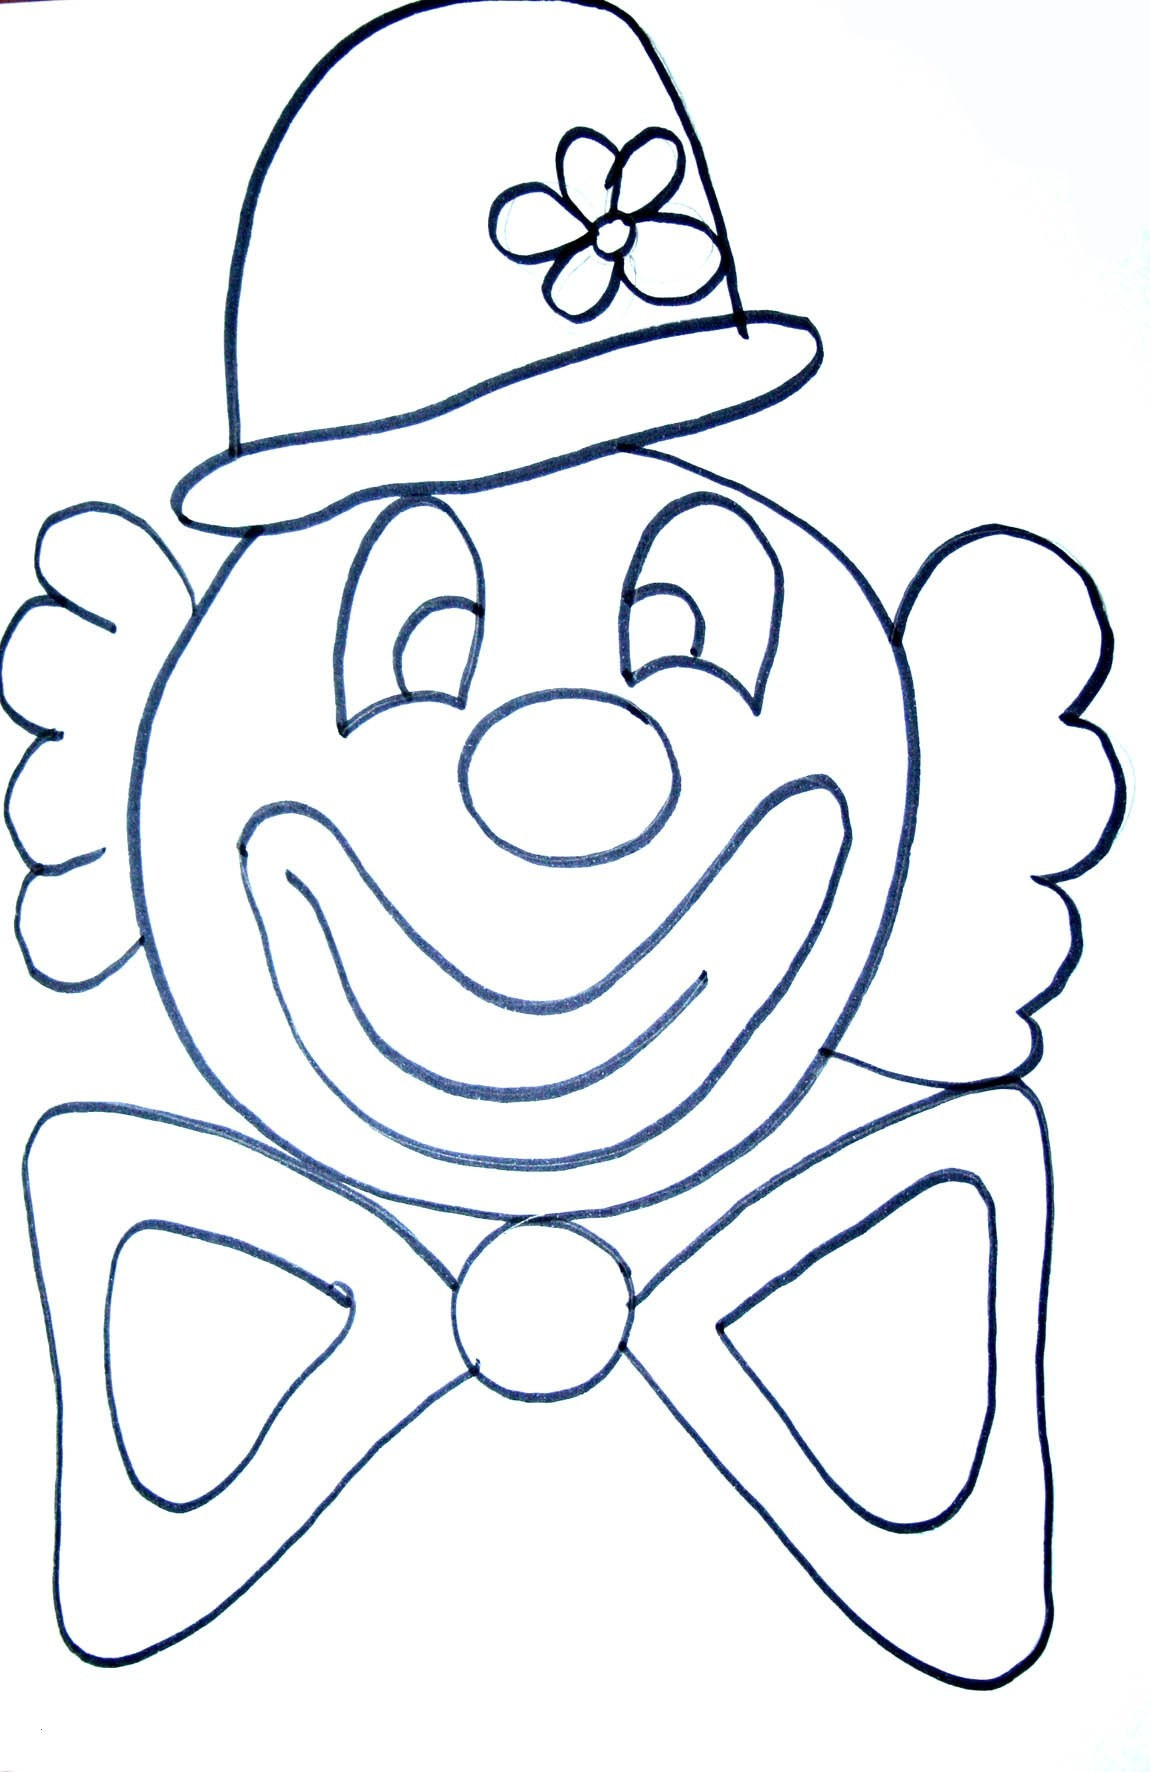 Clown Zum Ausmalen Frisch 40 Clown Ausmalbilder Ausdrucken Scoredatscore Best Clowns Sammlung